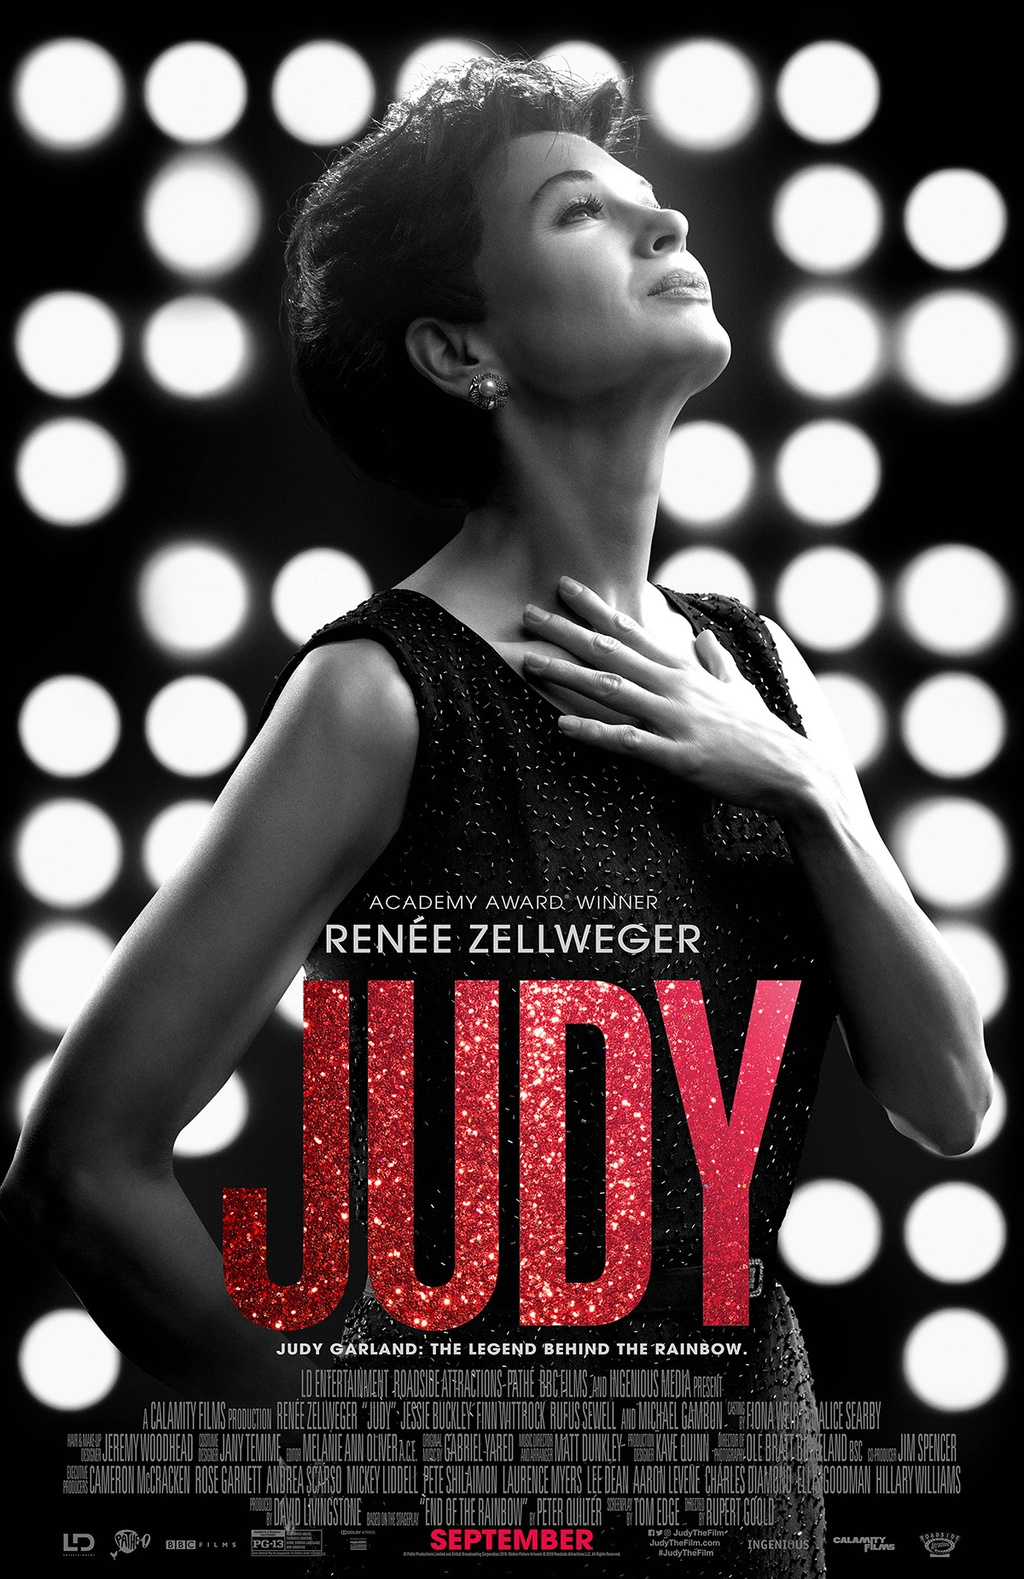 'Judy' - cuoc doi bi kich cua giong ca 'Over the Rainbow' hinh anh 1 Judy_poster_2.jpg